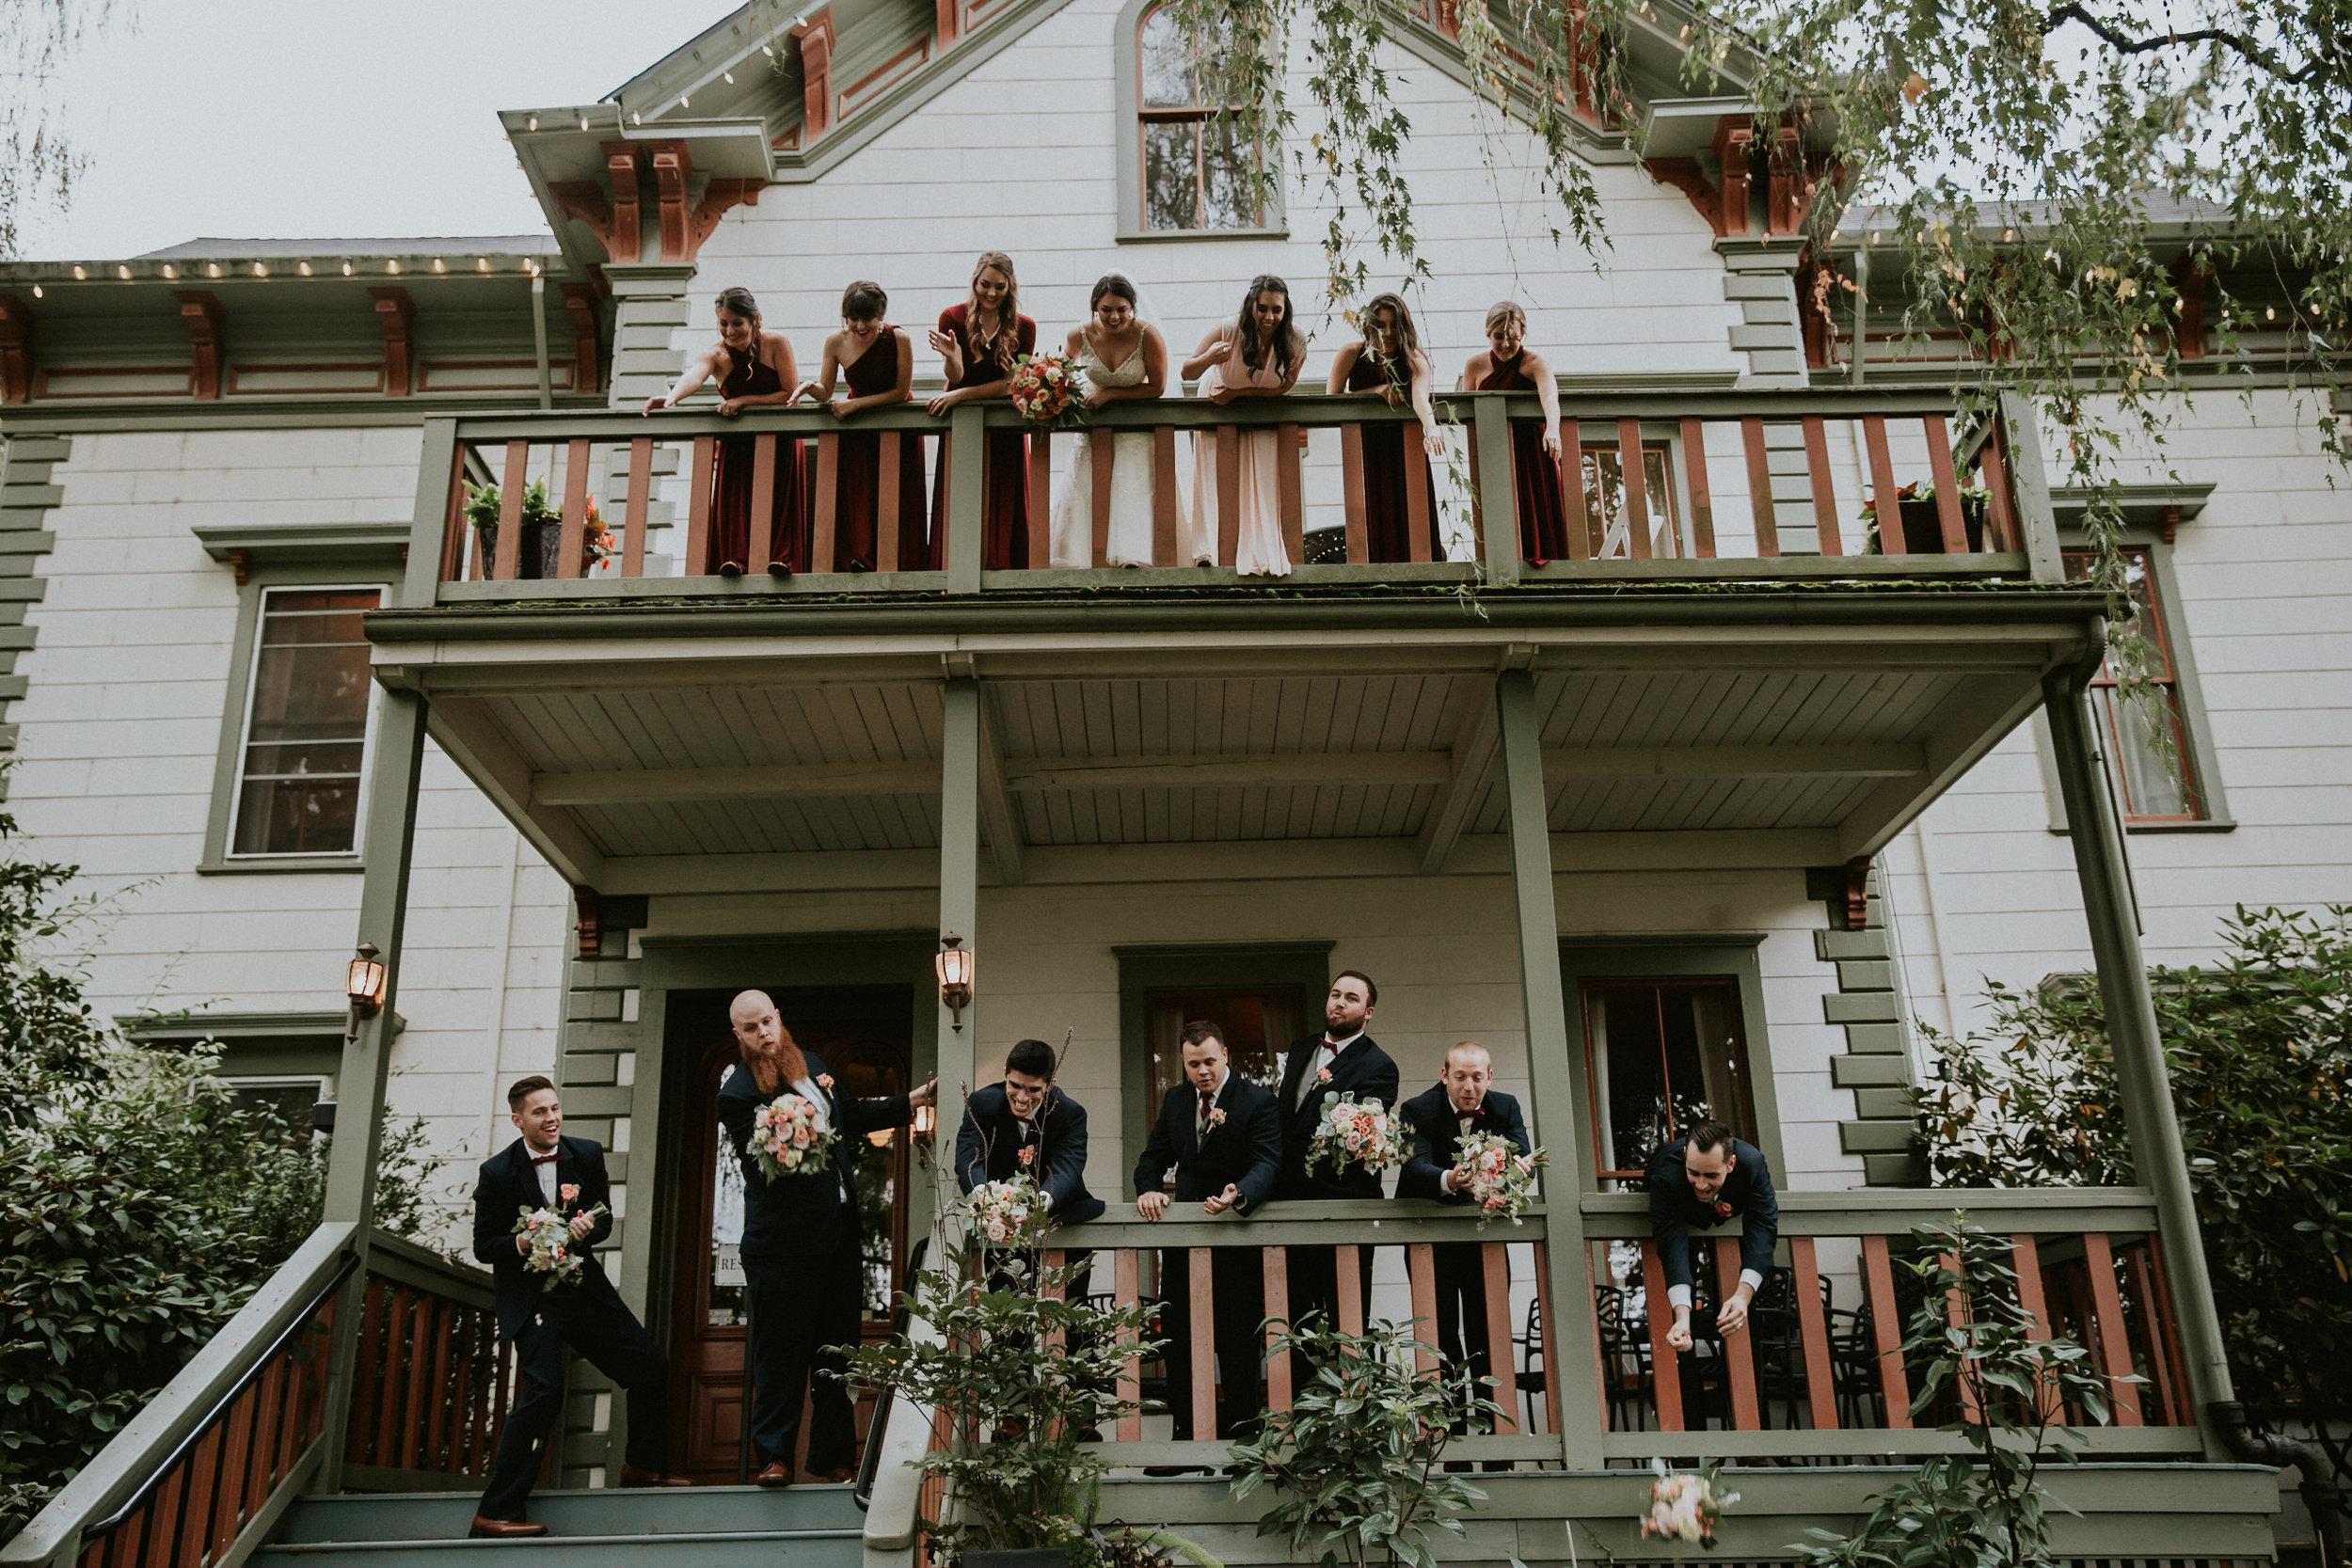 McMenamins_Cornelious_Pass_Roadhouse_wedding_photographer_AlfredTang-8.jpg